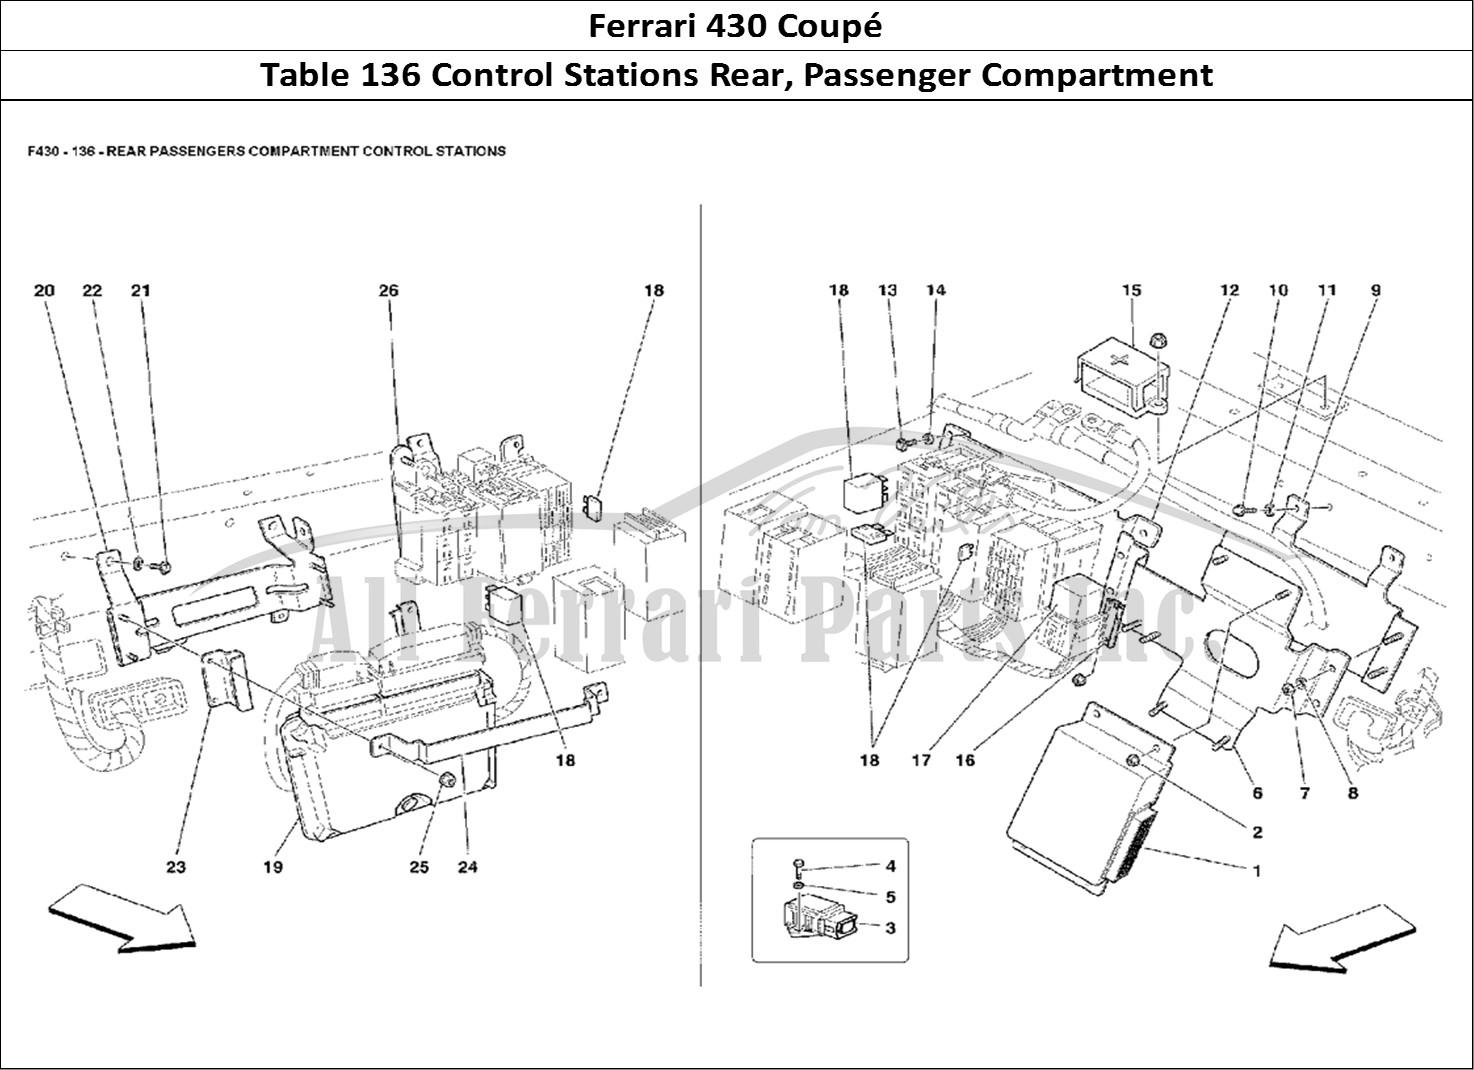 Buy original Ferrari 430 Coupé 136 Control Stations Rear